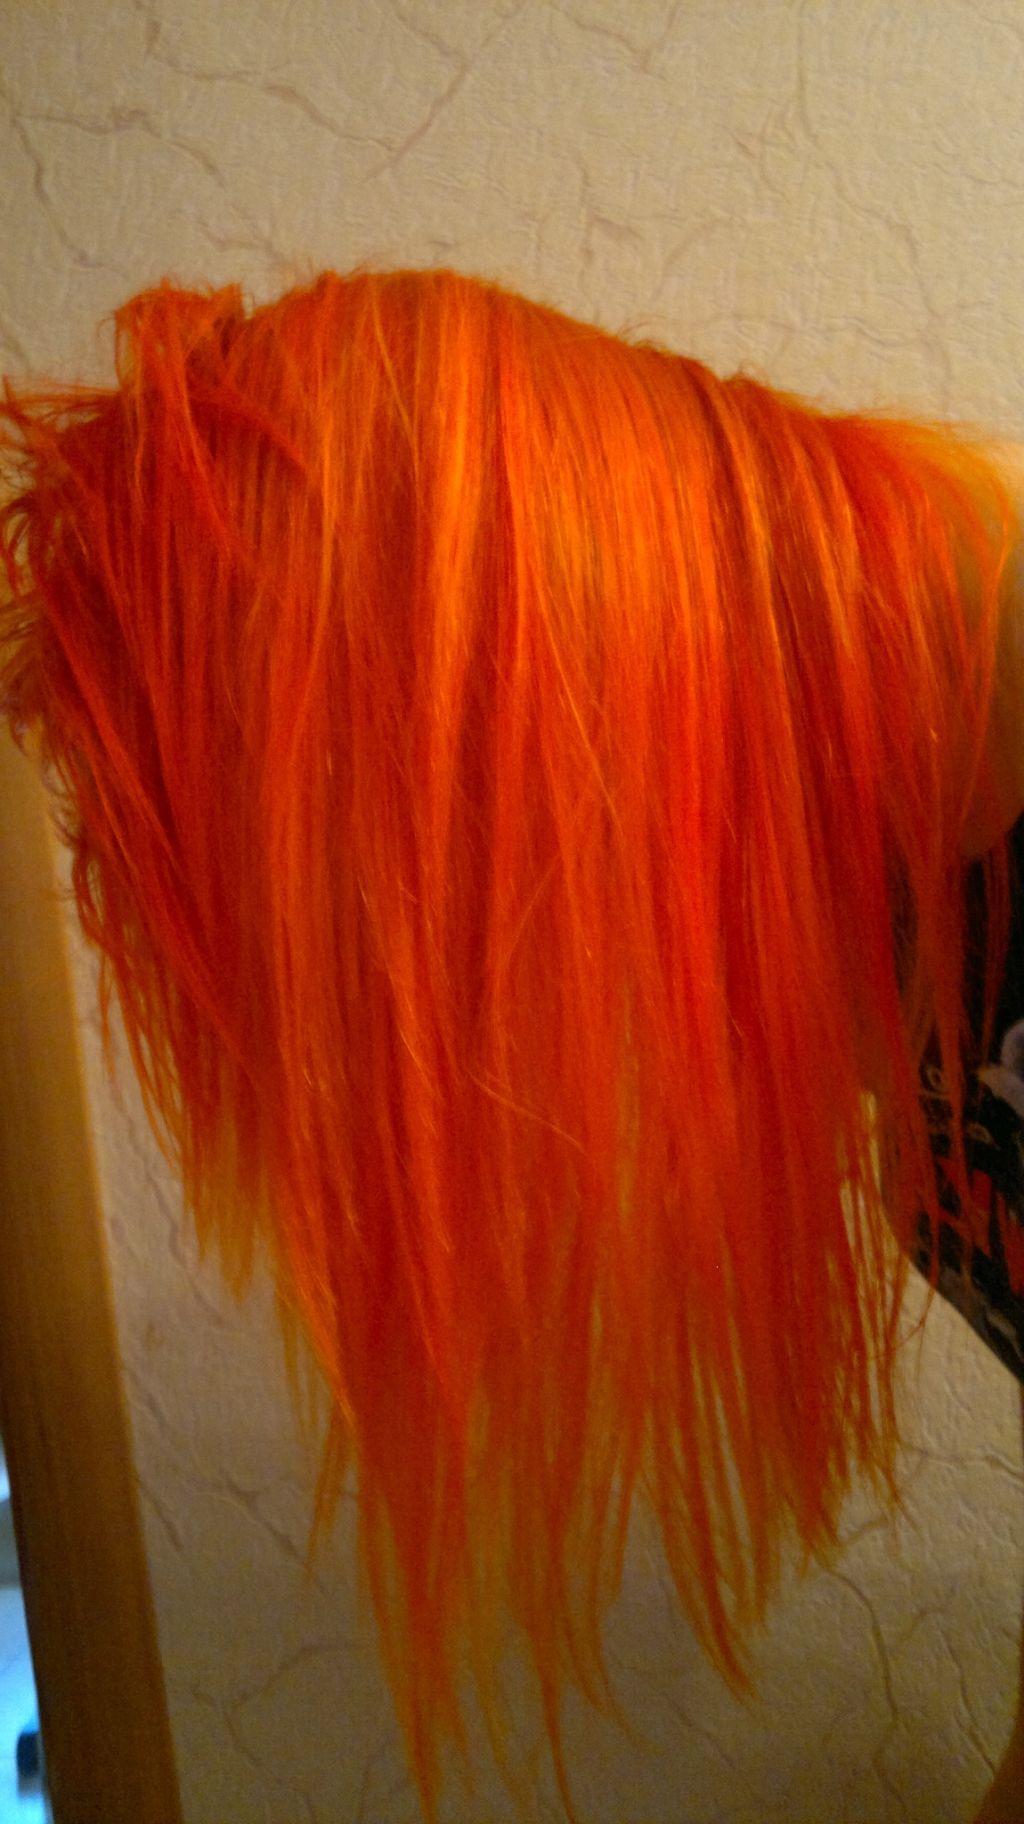 napalm orange hair special effects nataliakefirina